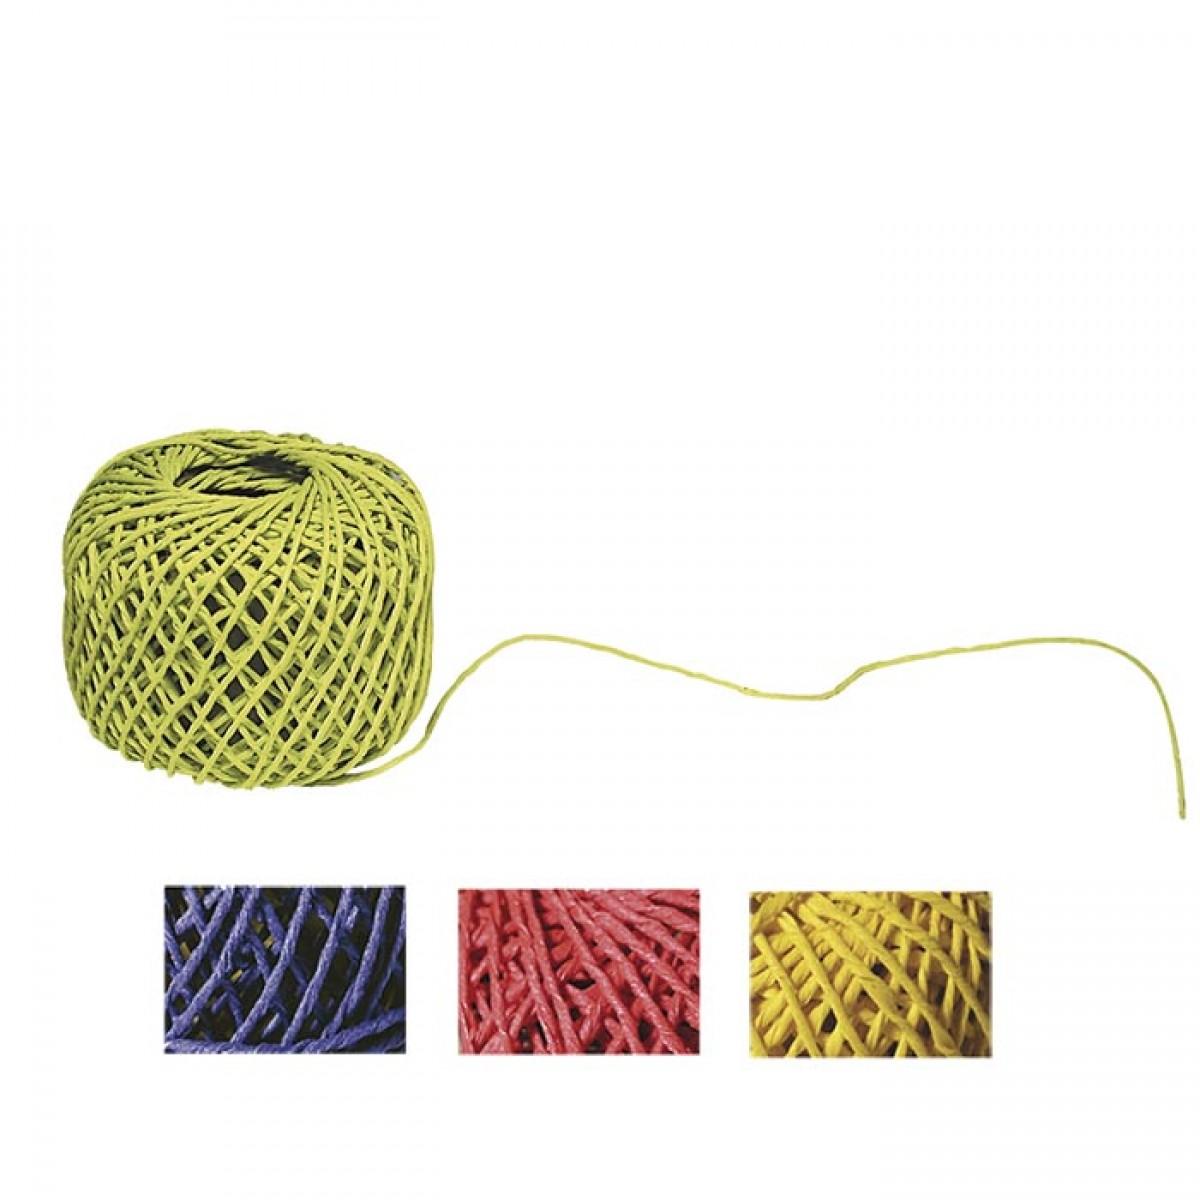 Rayher Κορδόνι Διάφορα Χρώματα 1mm Υλικά Χειροτεχνίας